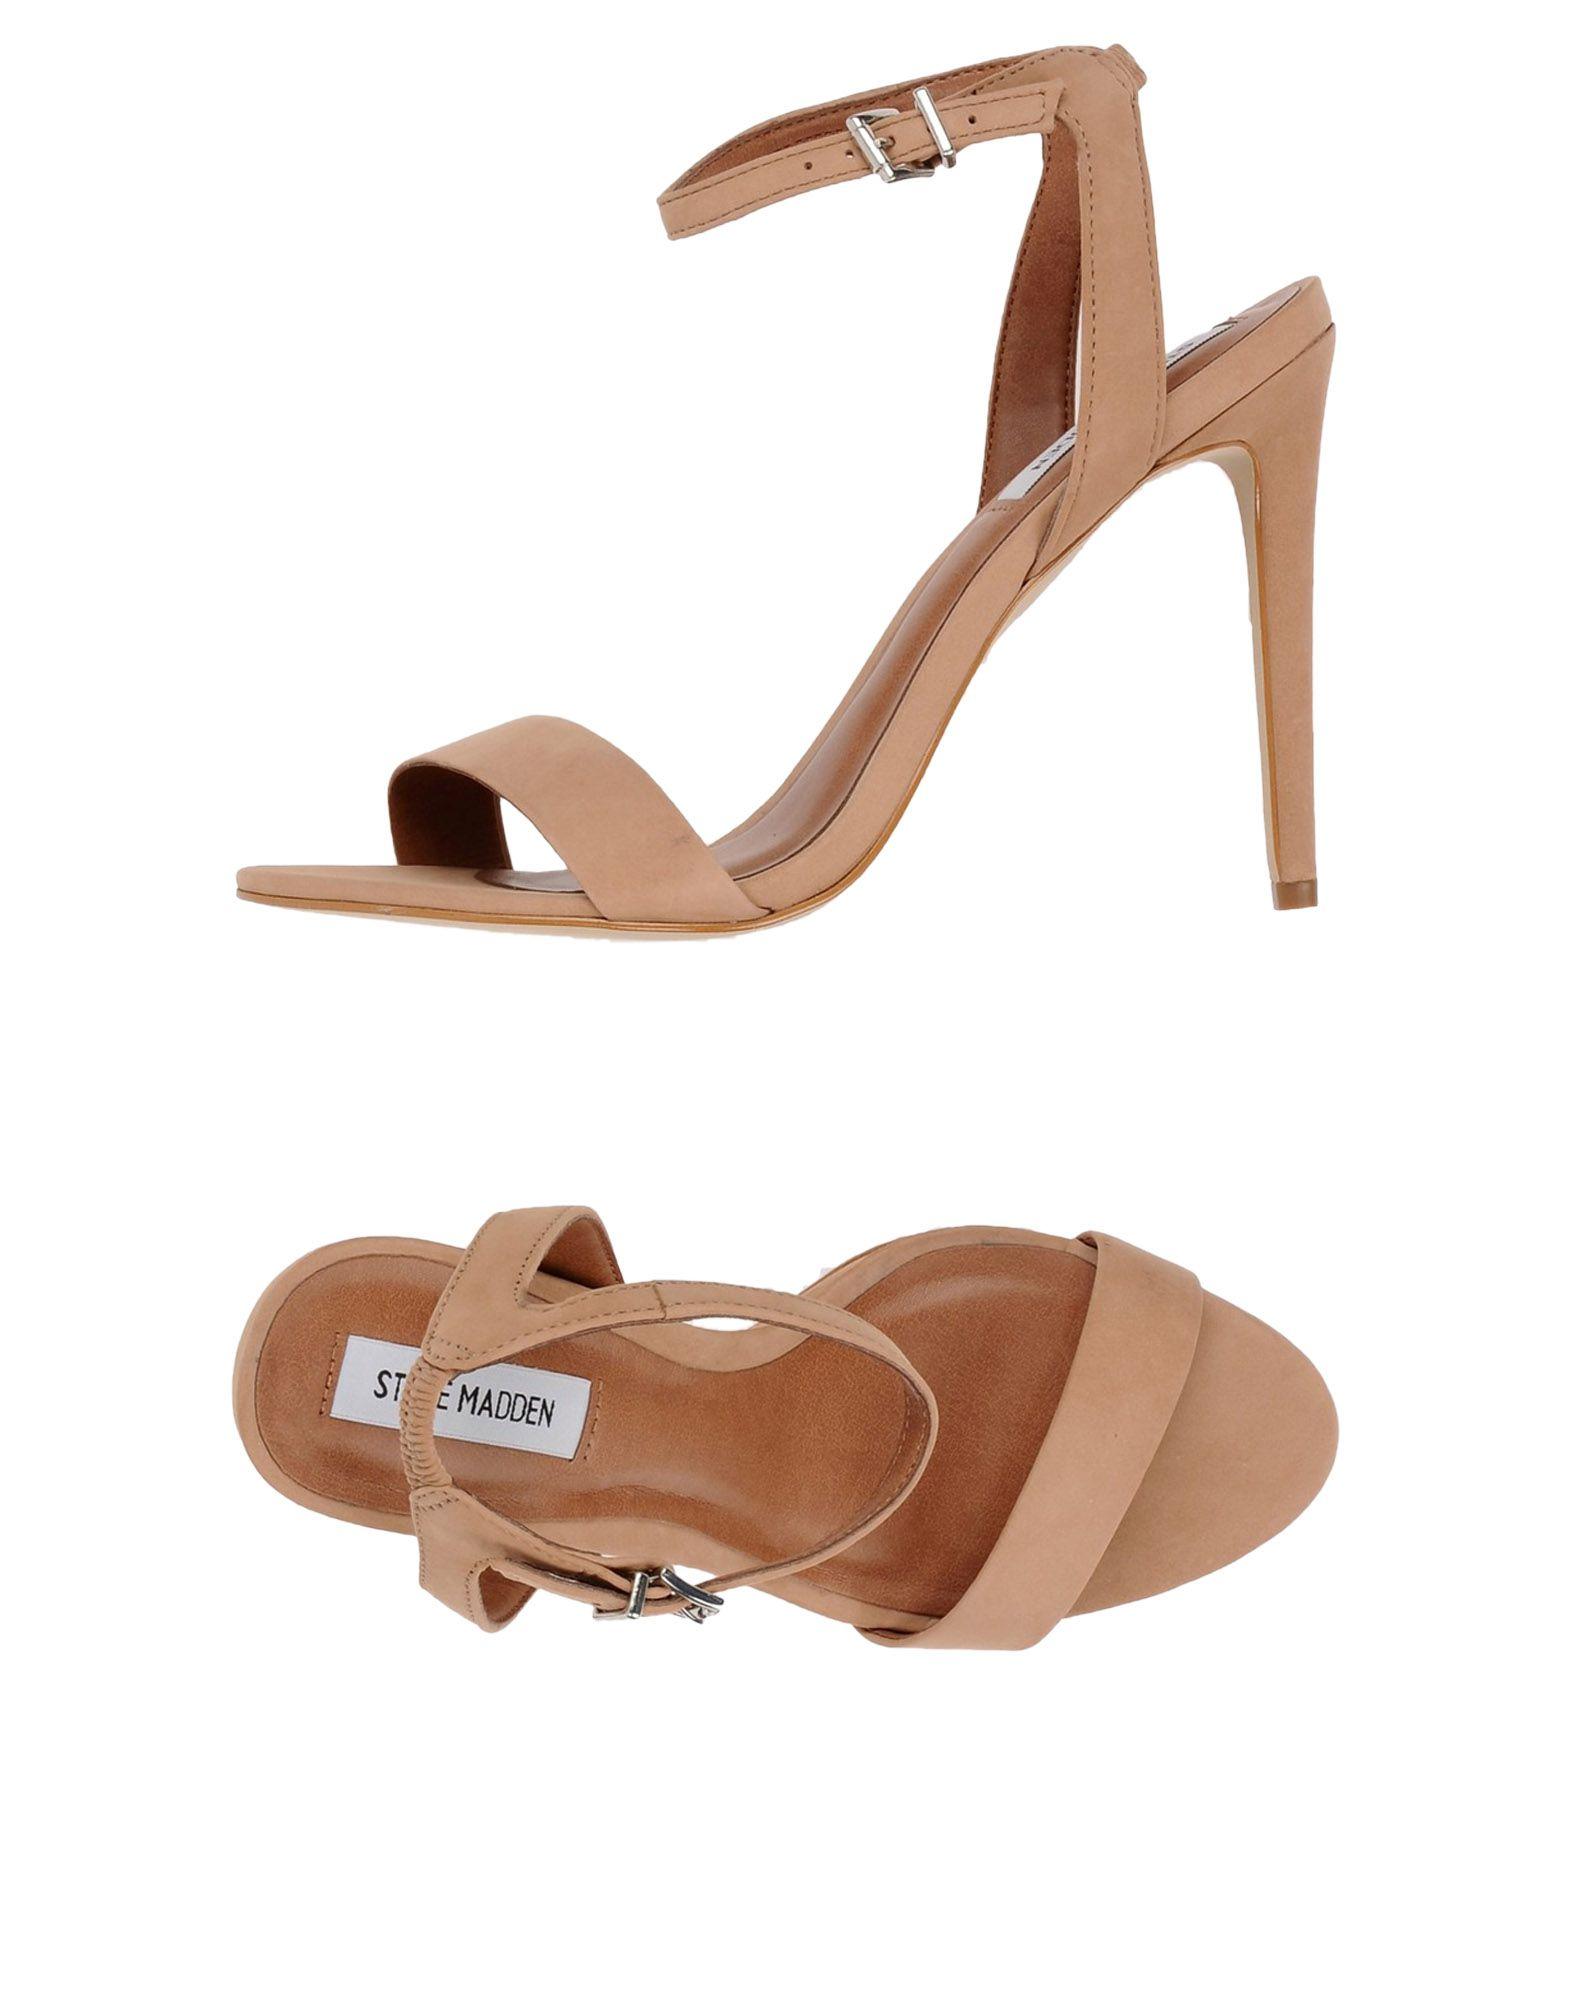 7ac5f894dbb Steve Madden Landen High Heel Sandal - Sandals - Women Steve Madden ...